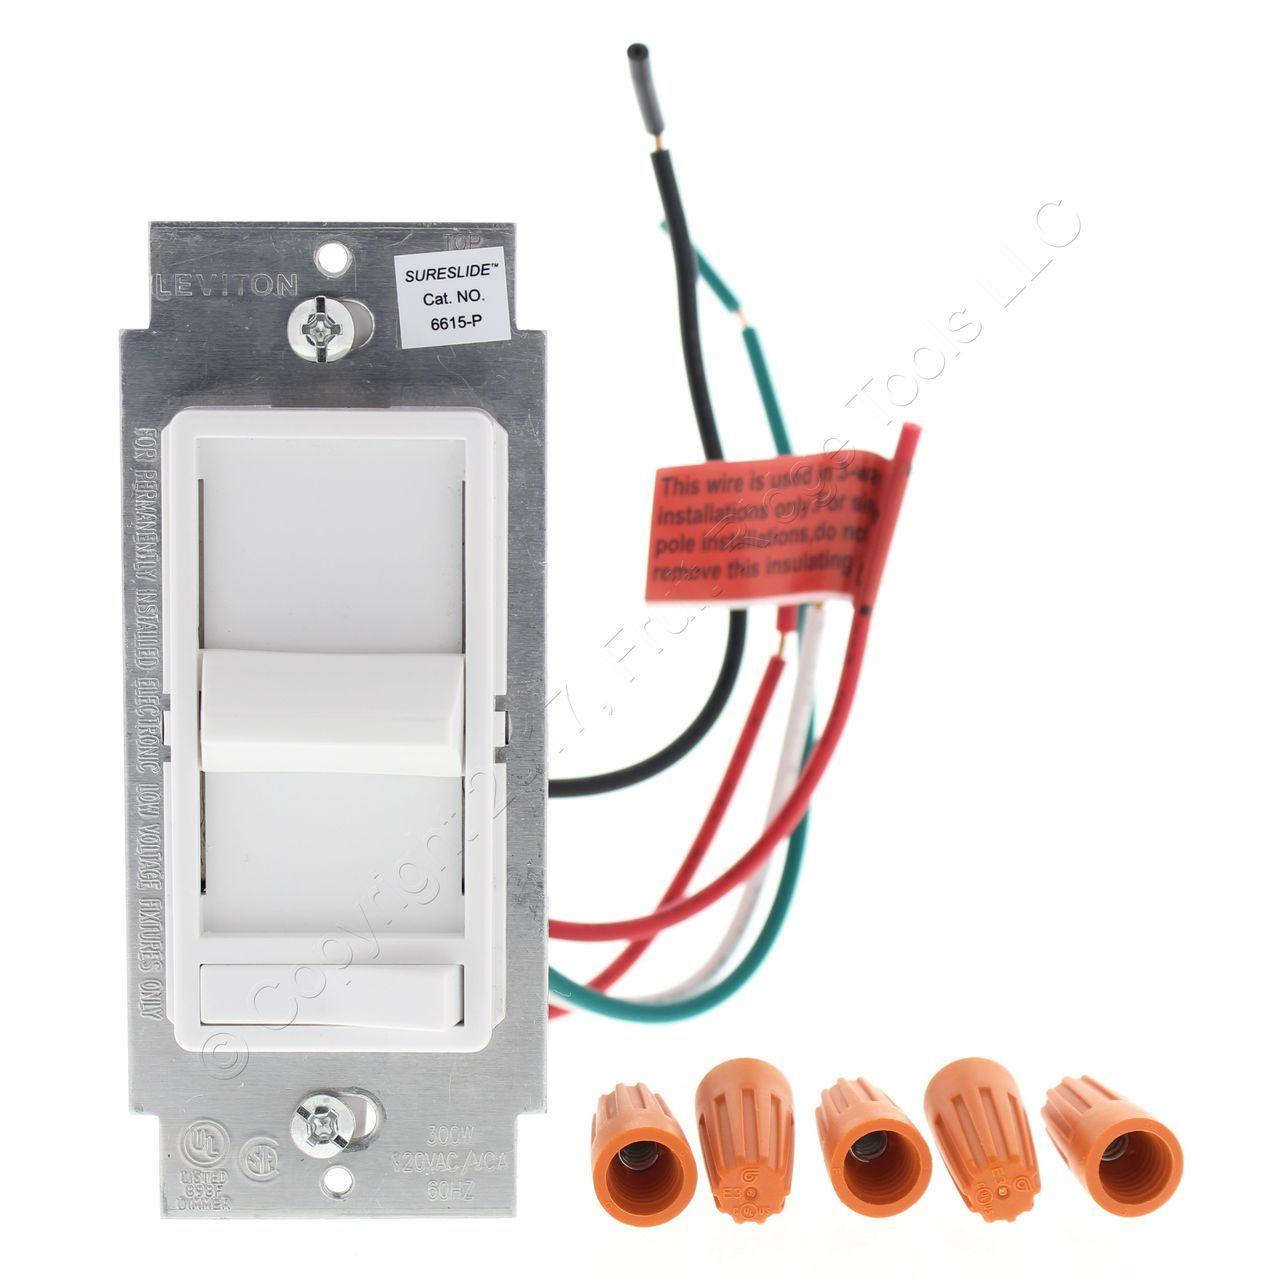 SA_2701] Supplies Wiring Supplies Leviton Sureslide Dimmer Switch Almond  Download DiagramTzici Iosco Viha Flui Viha Stica Aryon Hist Salv Mohammedshrine Librar  Wiring 101